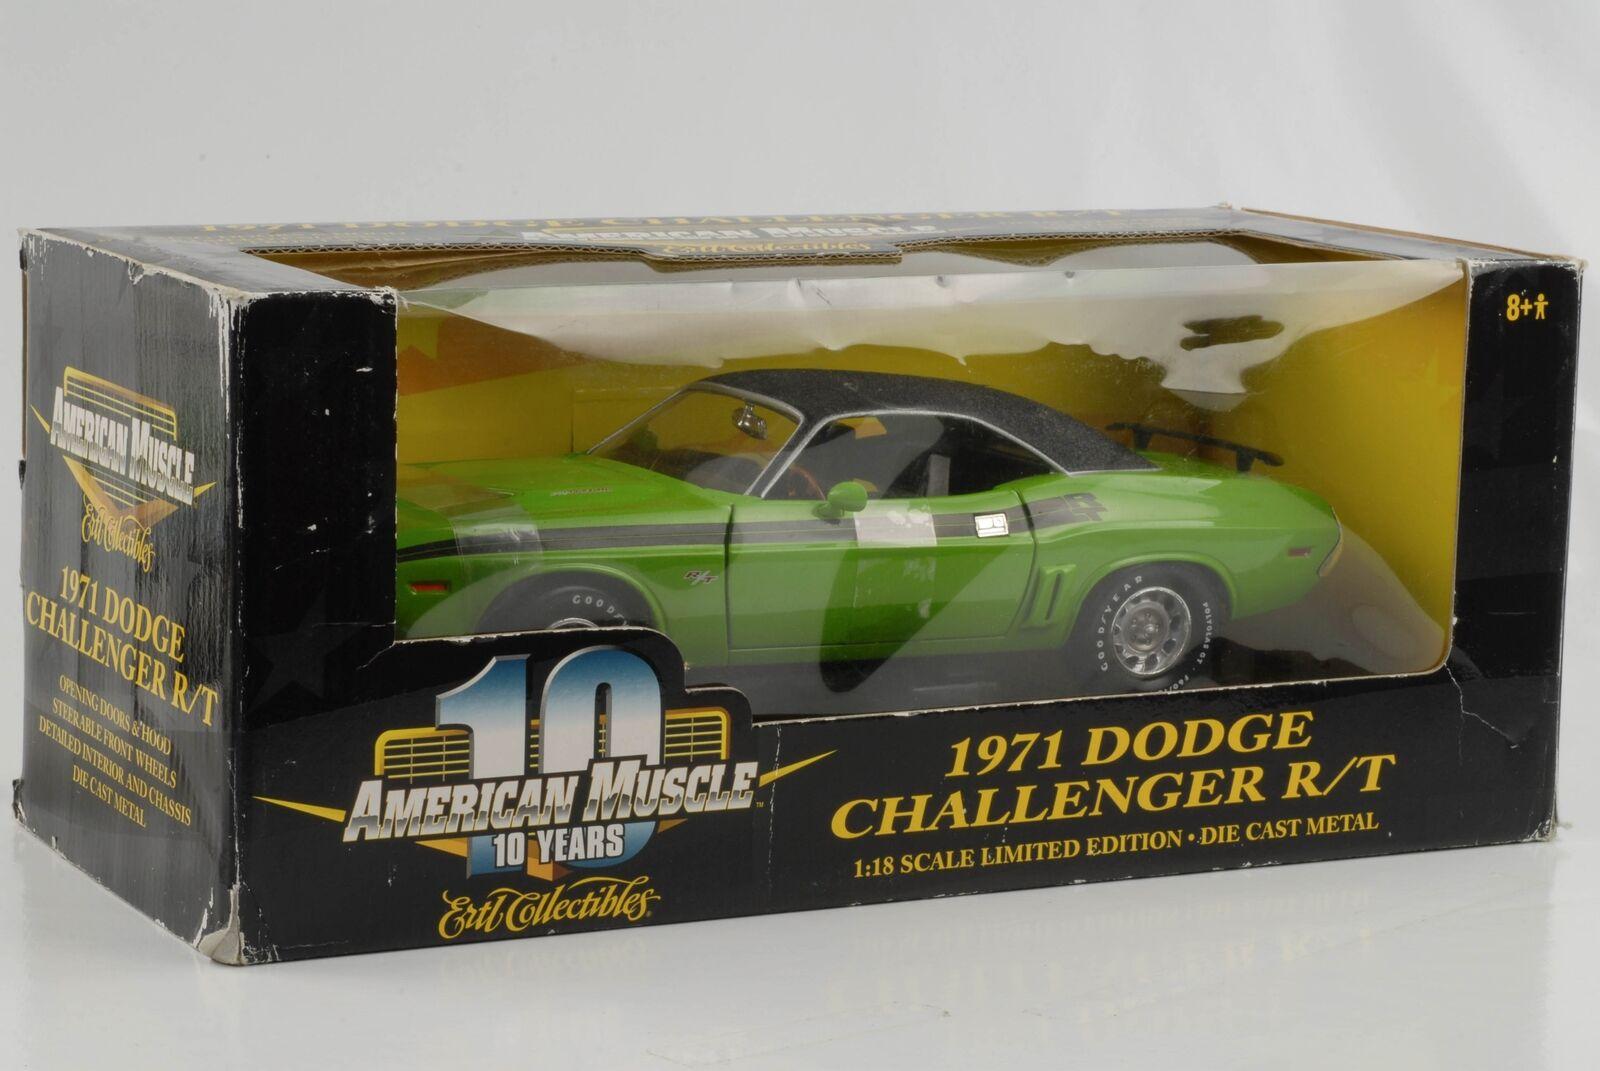 1971 Dodge Challenger R/T Lime Green Vinildach 1:18 Ertl